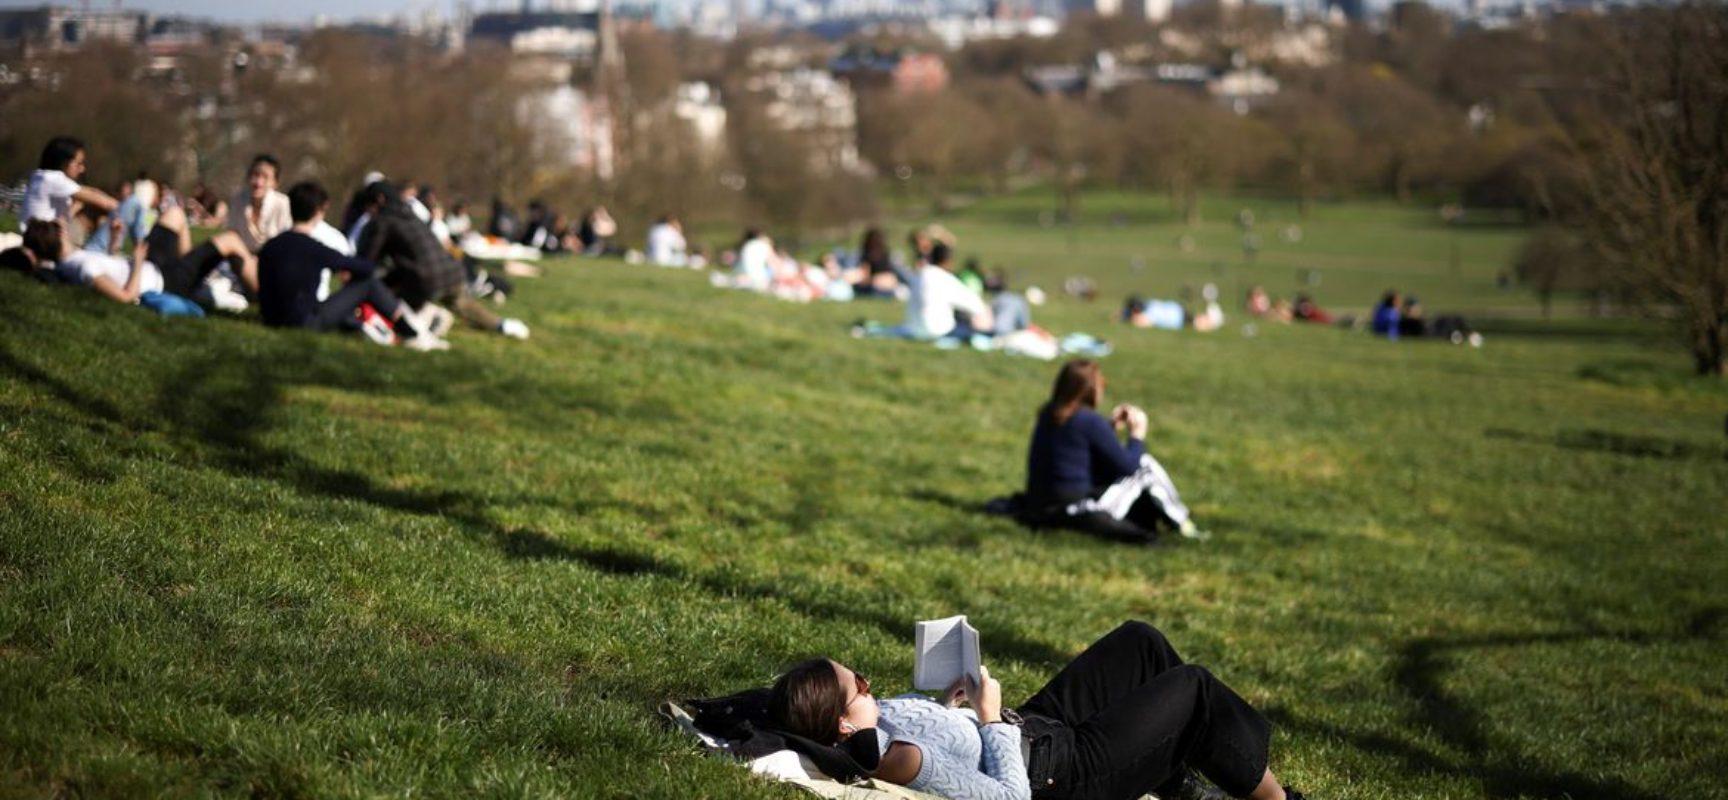 Pandemia: Inglaterra ameniza lockdown, mas premiê Johnson pede cautela